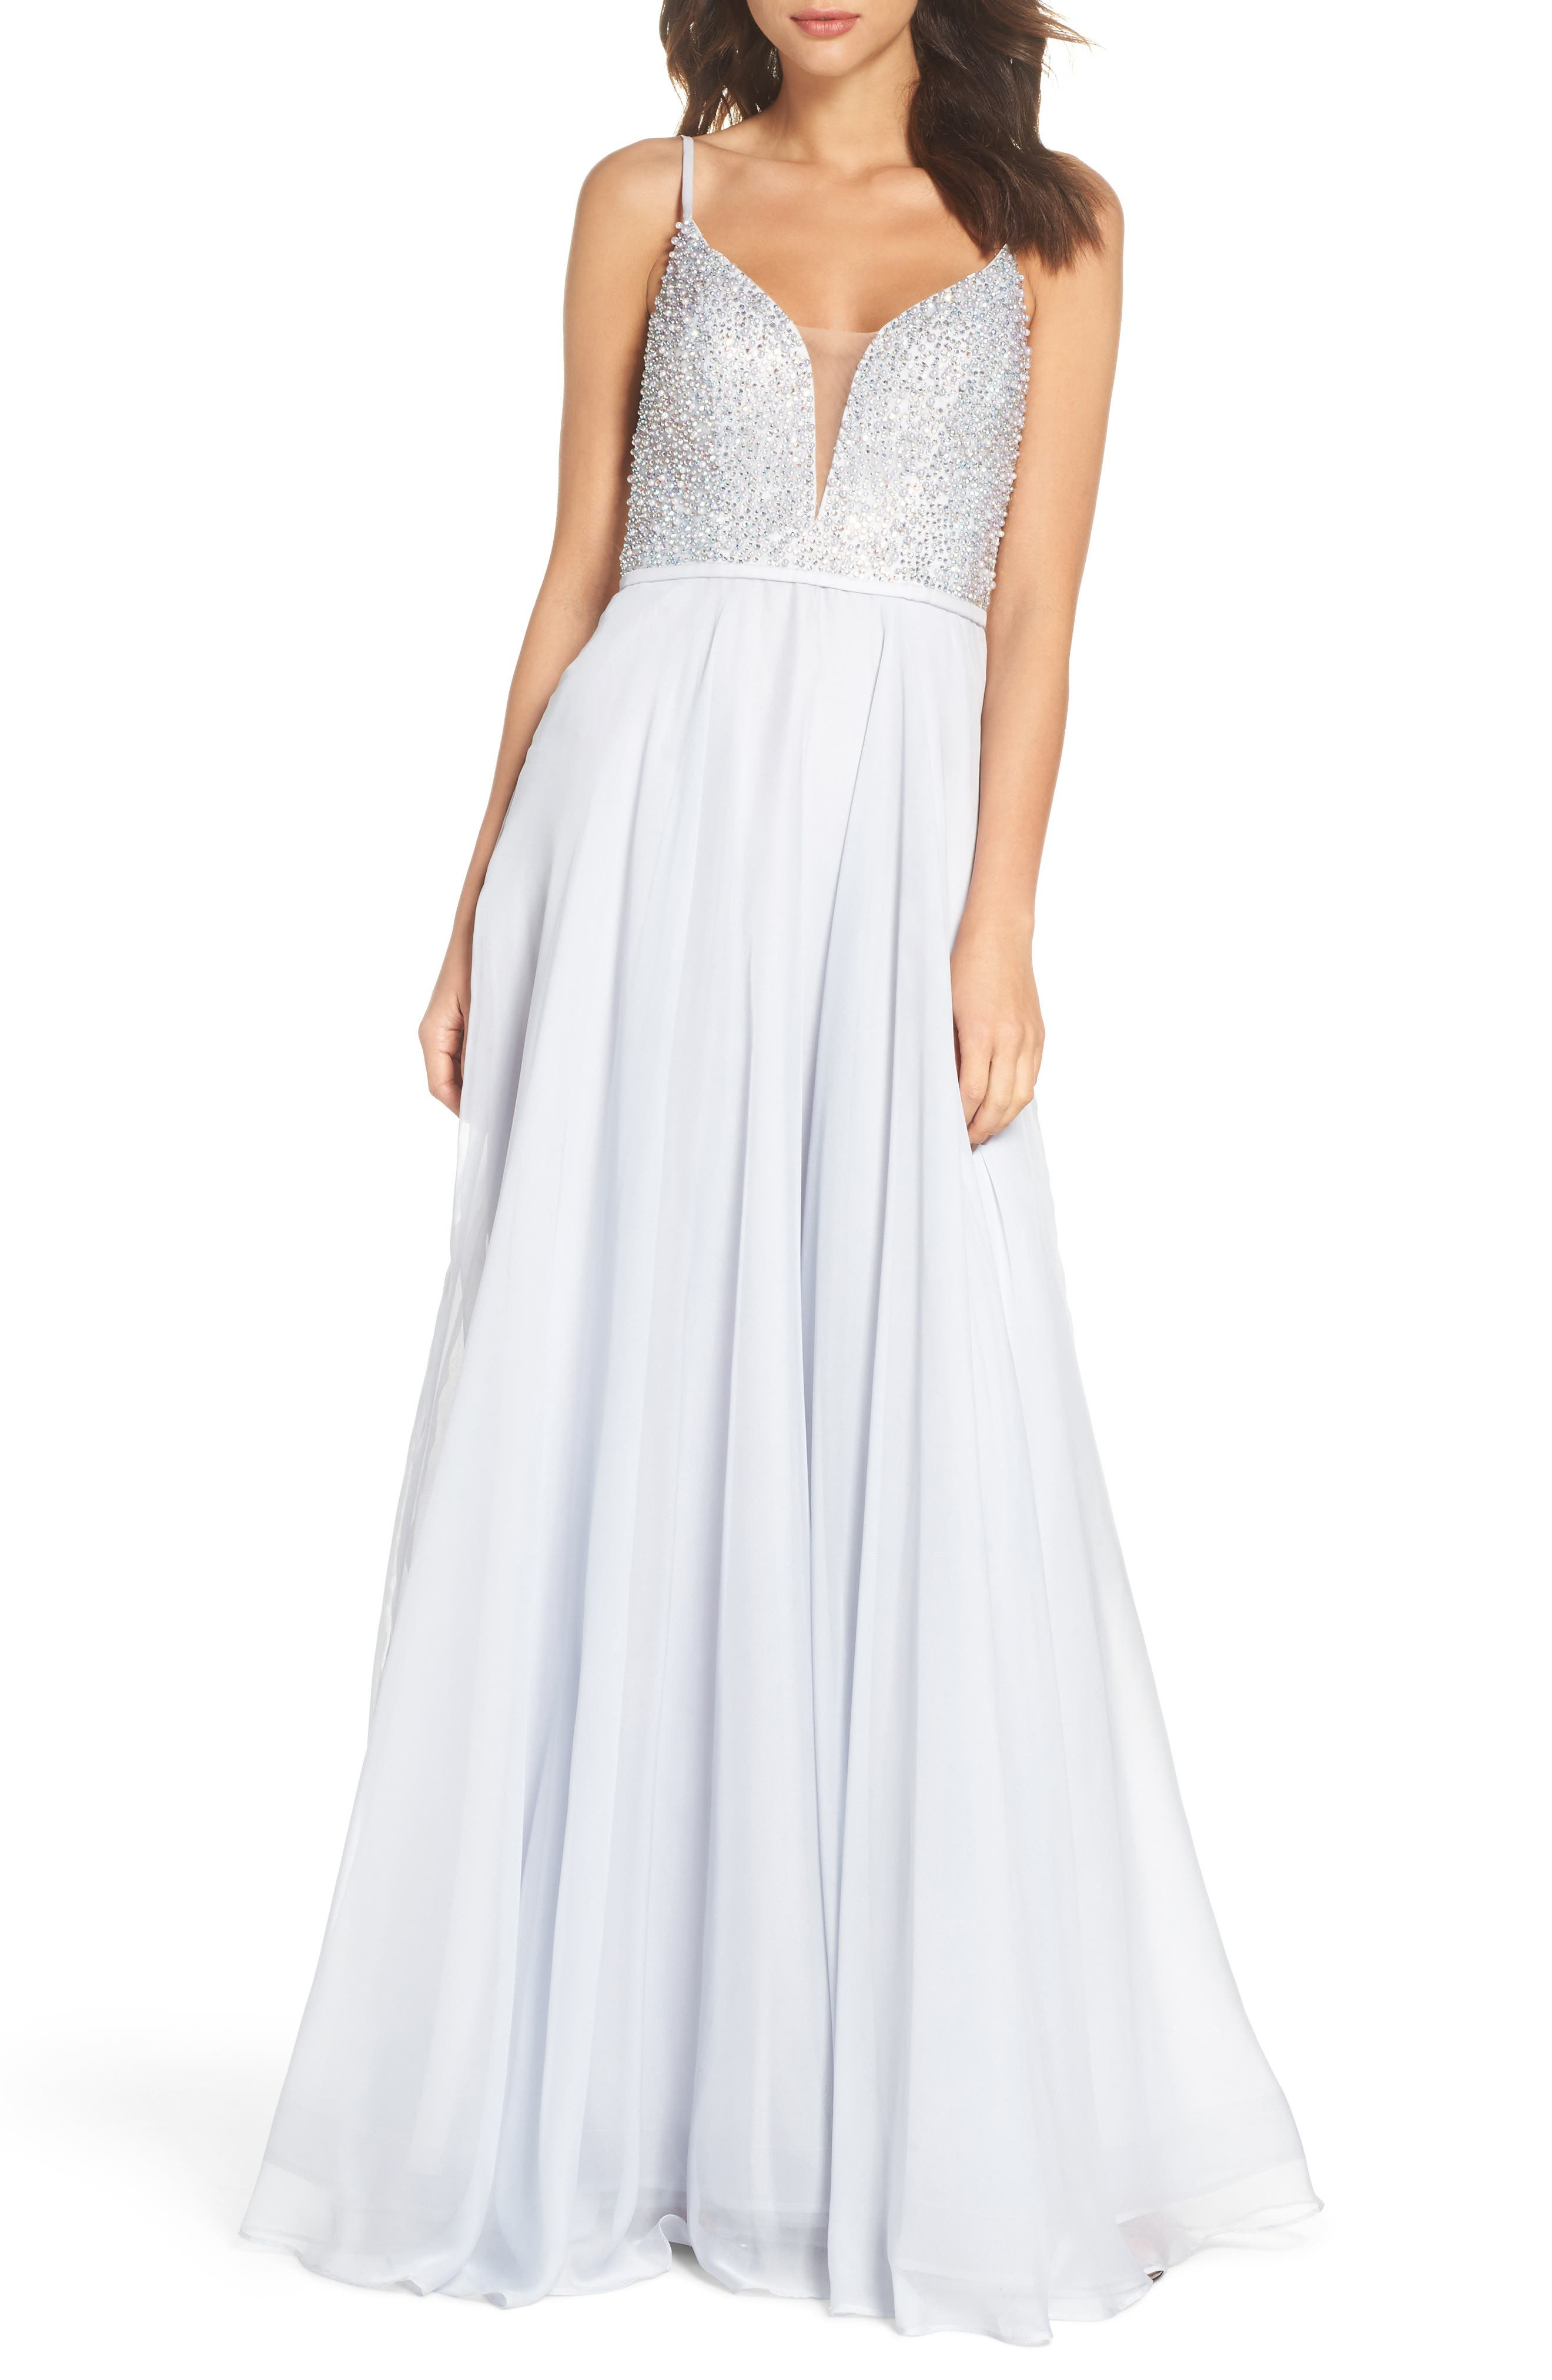 Main Image - La Femme Beaded Chiffon Gown